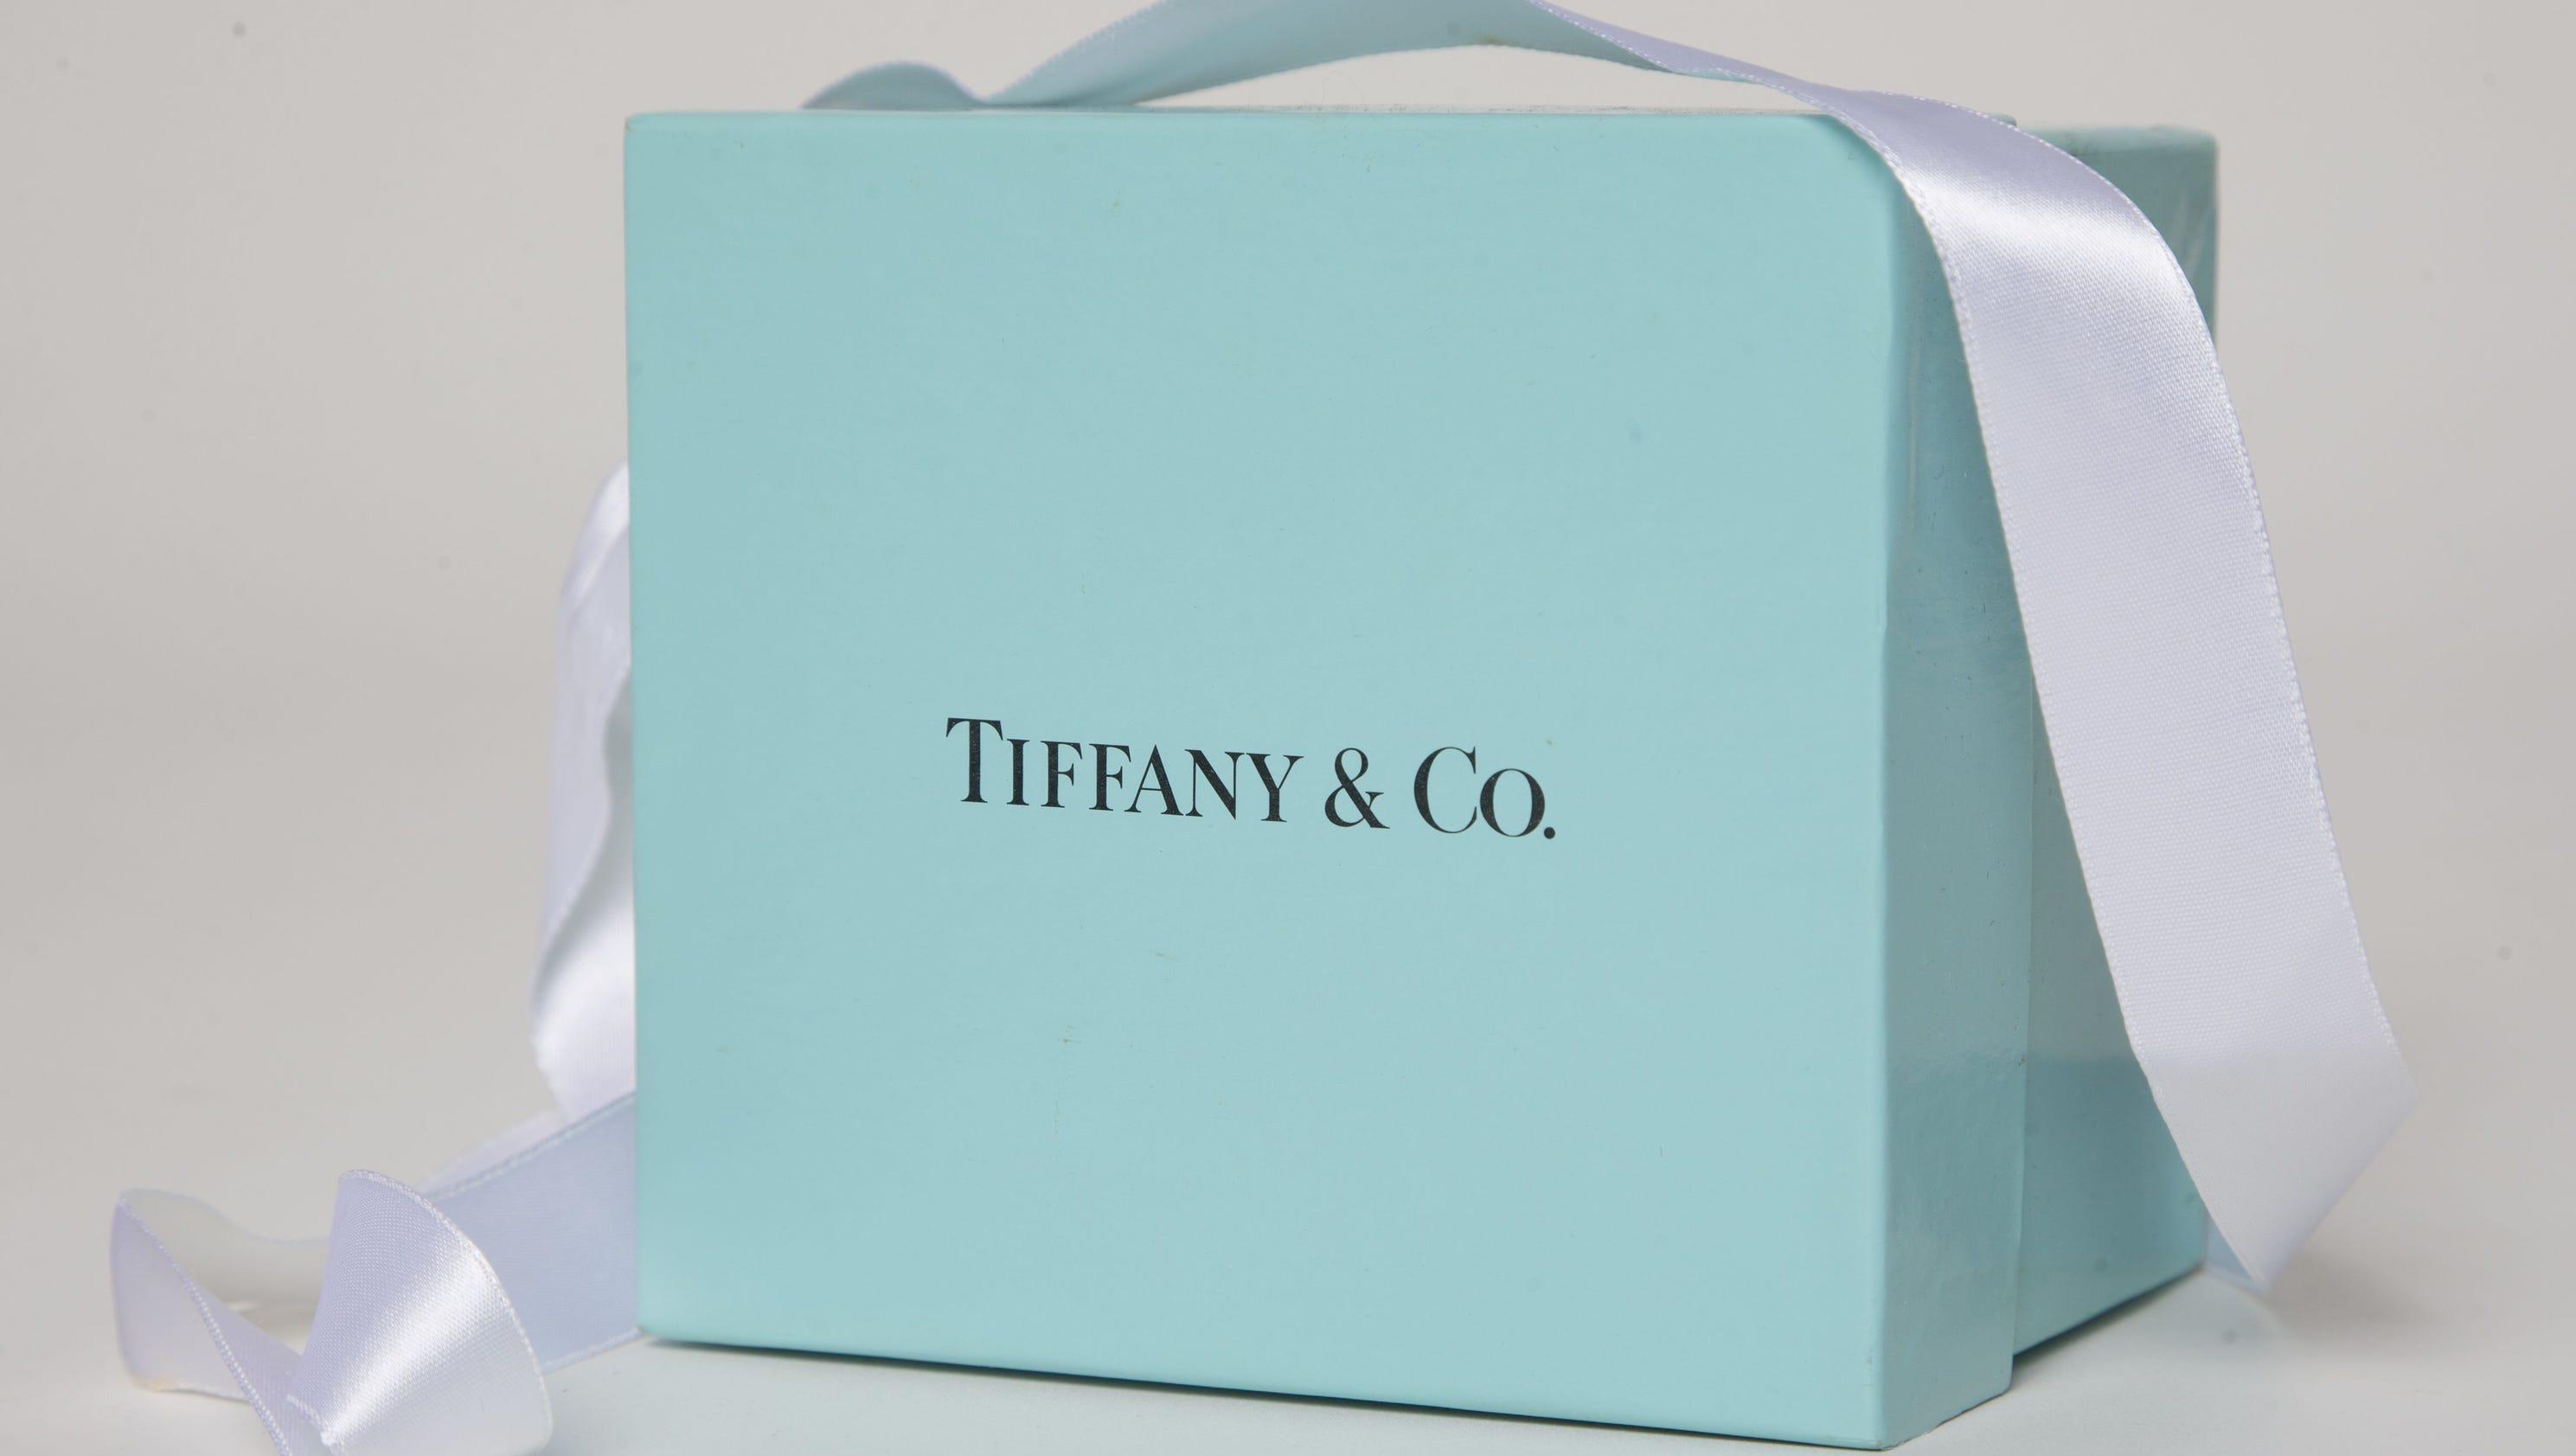 Tiffany & Co. leaving Downtown Cincinnati, moving to Kenwood Towne ...